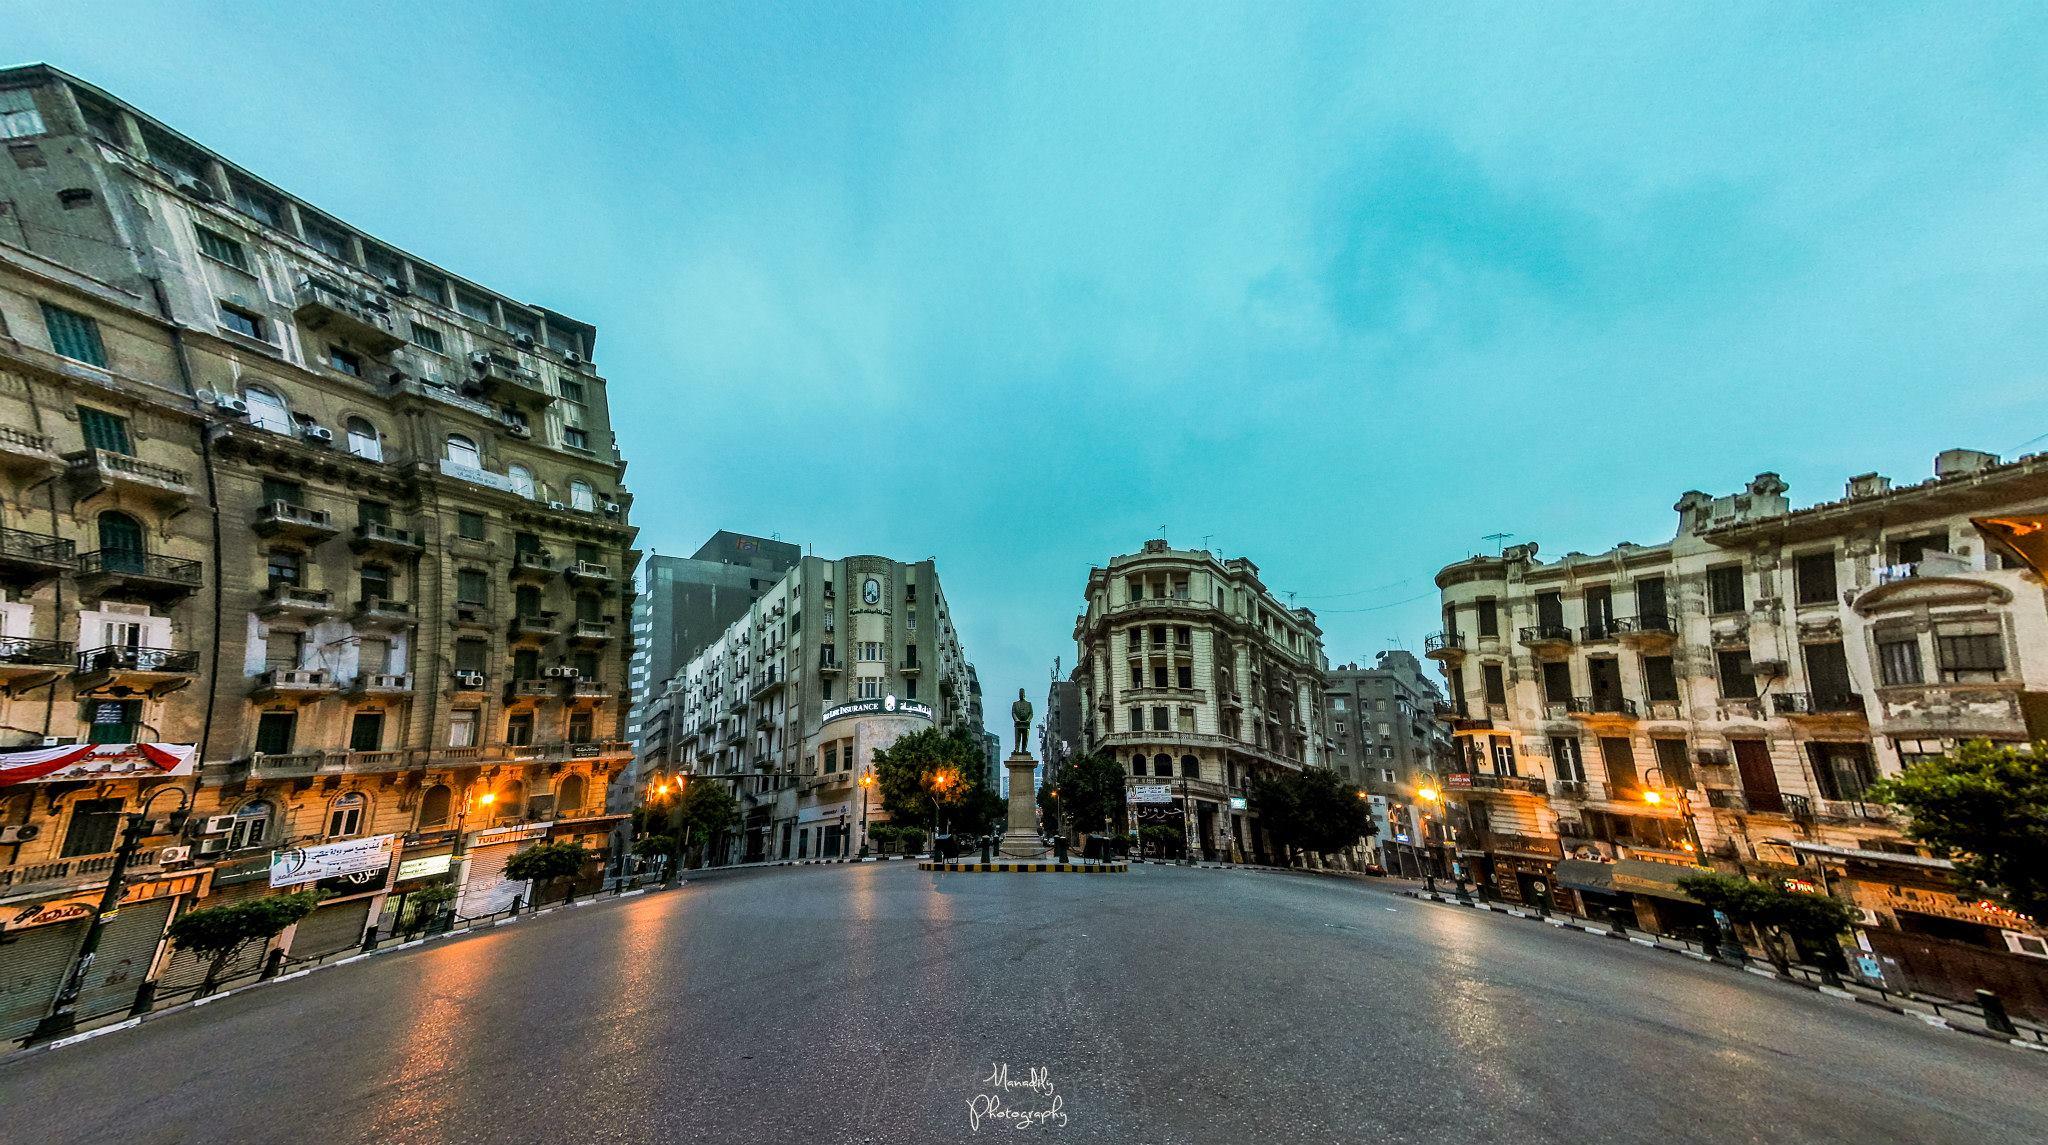 بالصور صور عن مصر , اجمل الصور عن مصر 169 15